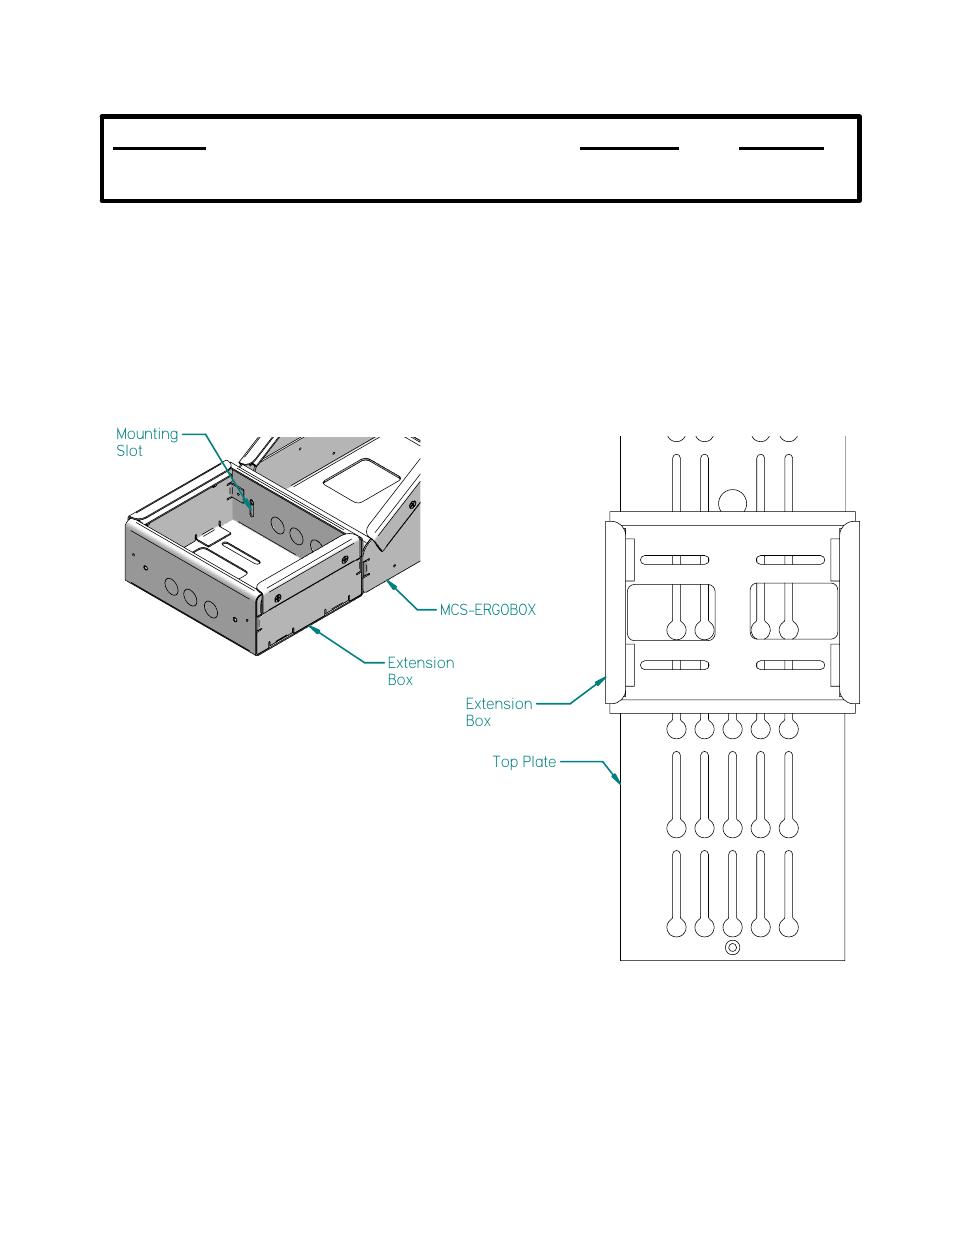 gamber johnson 7160 0028 user manual 4 pages rh manualsdir com Gamber-Johnson CF-30 Dock Gamber-Johnson Toughbook Docking Station